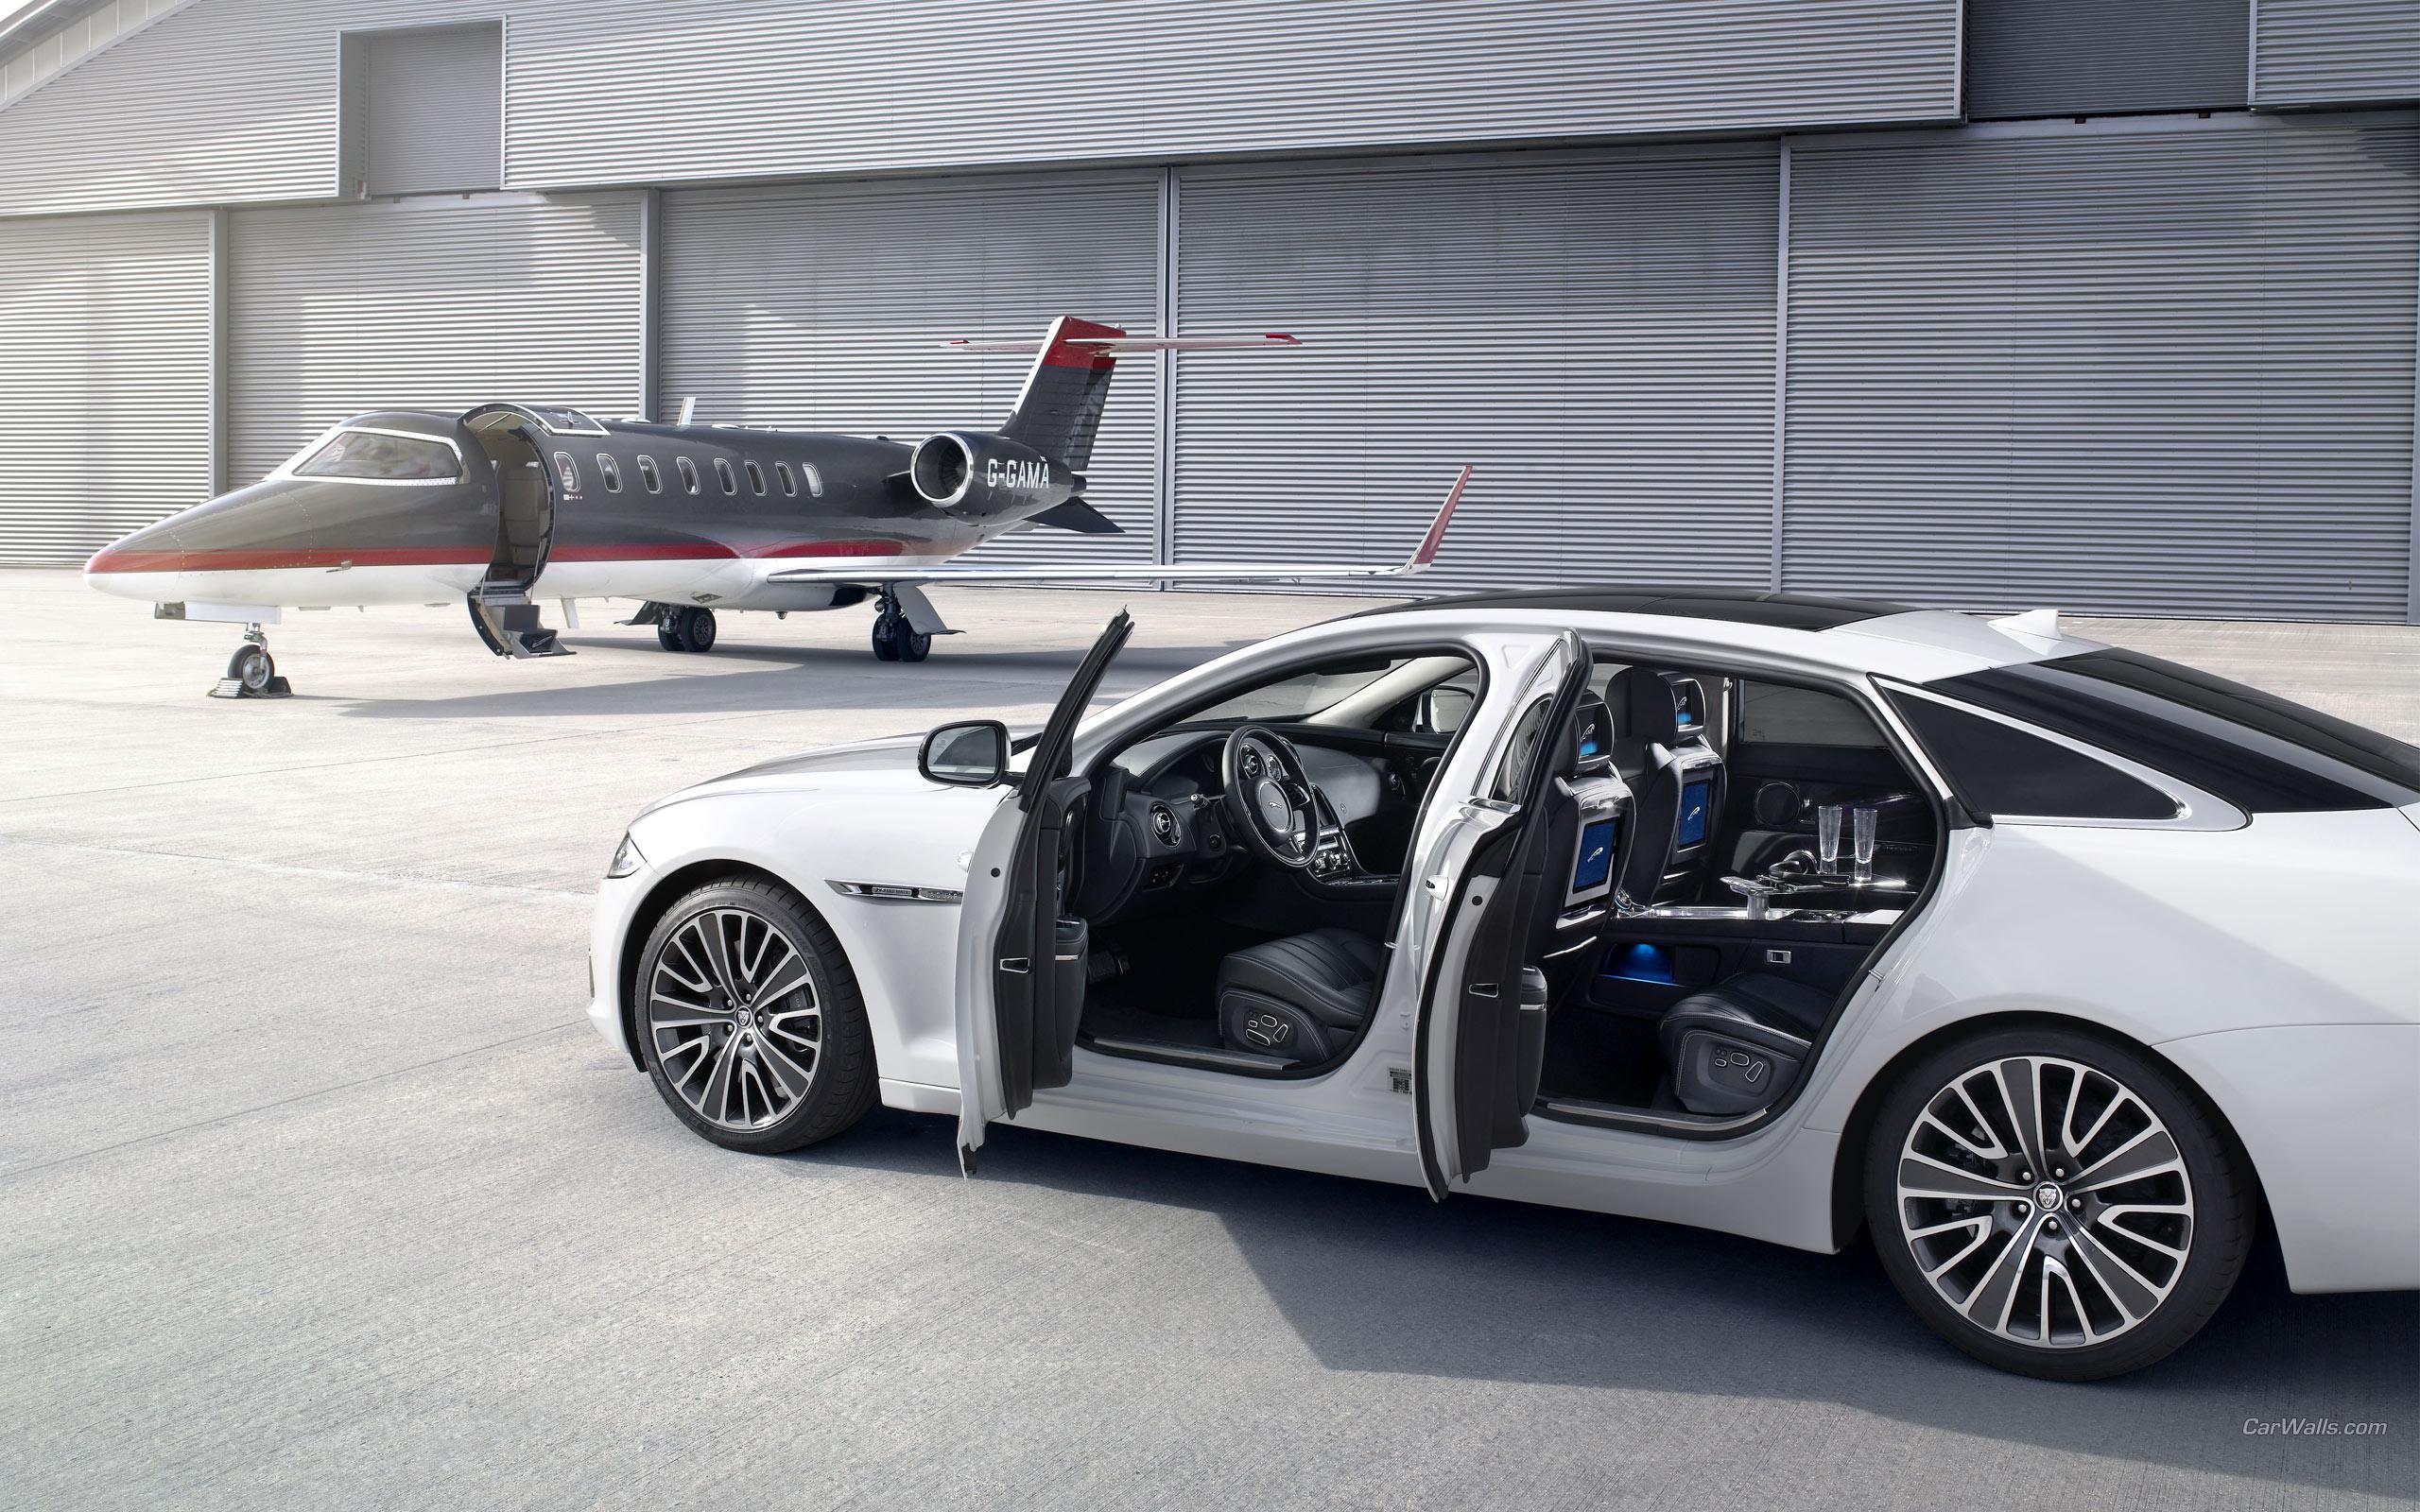 Jaguar Car And Private Jet Hd Wallpaper 17239 Ask Limousine